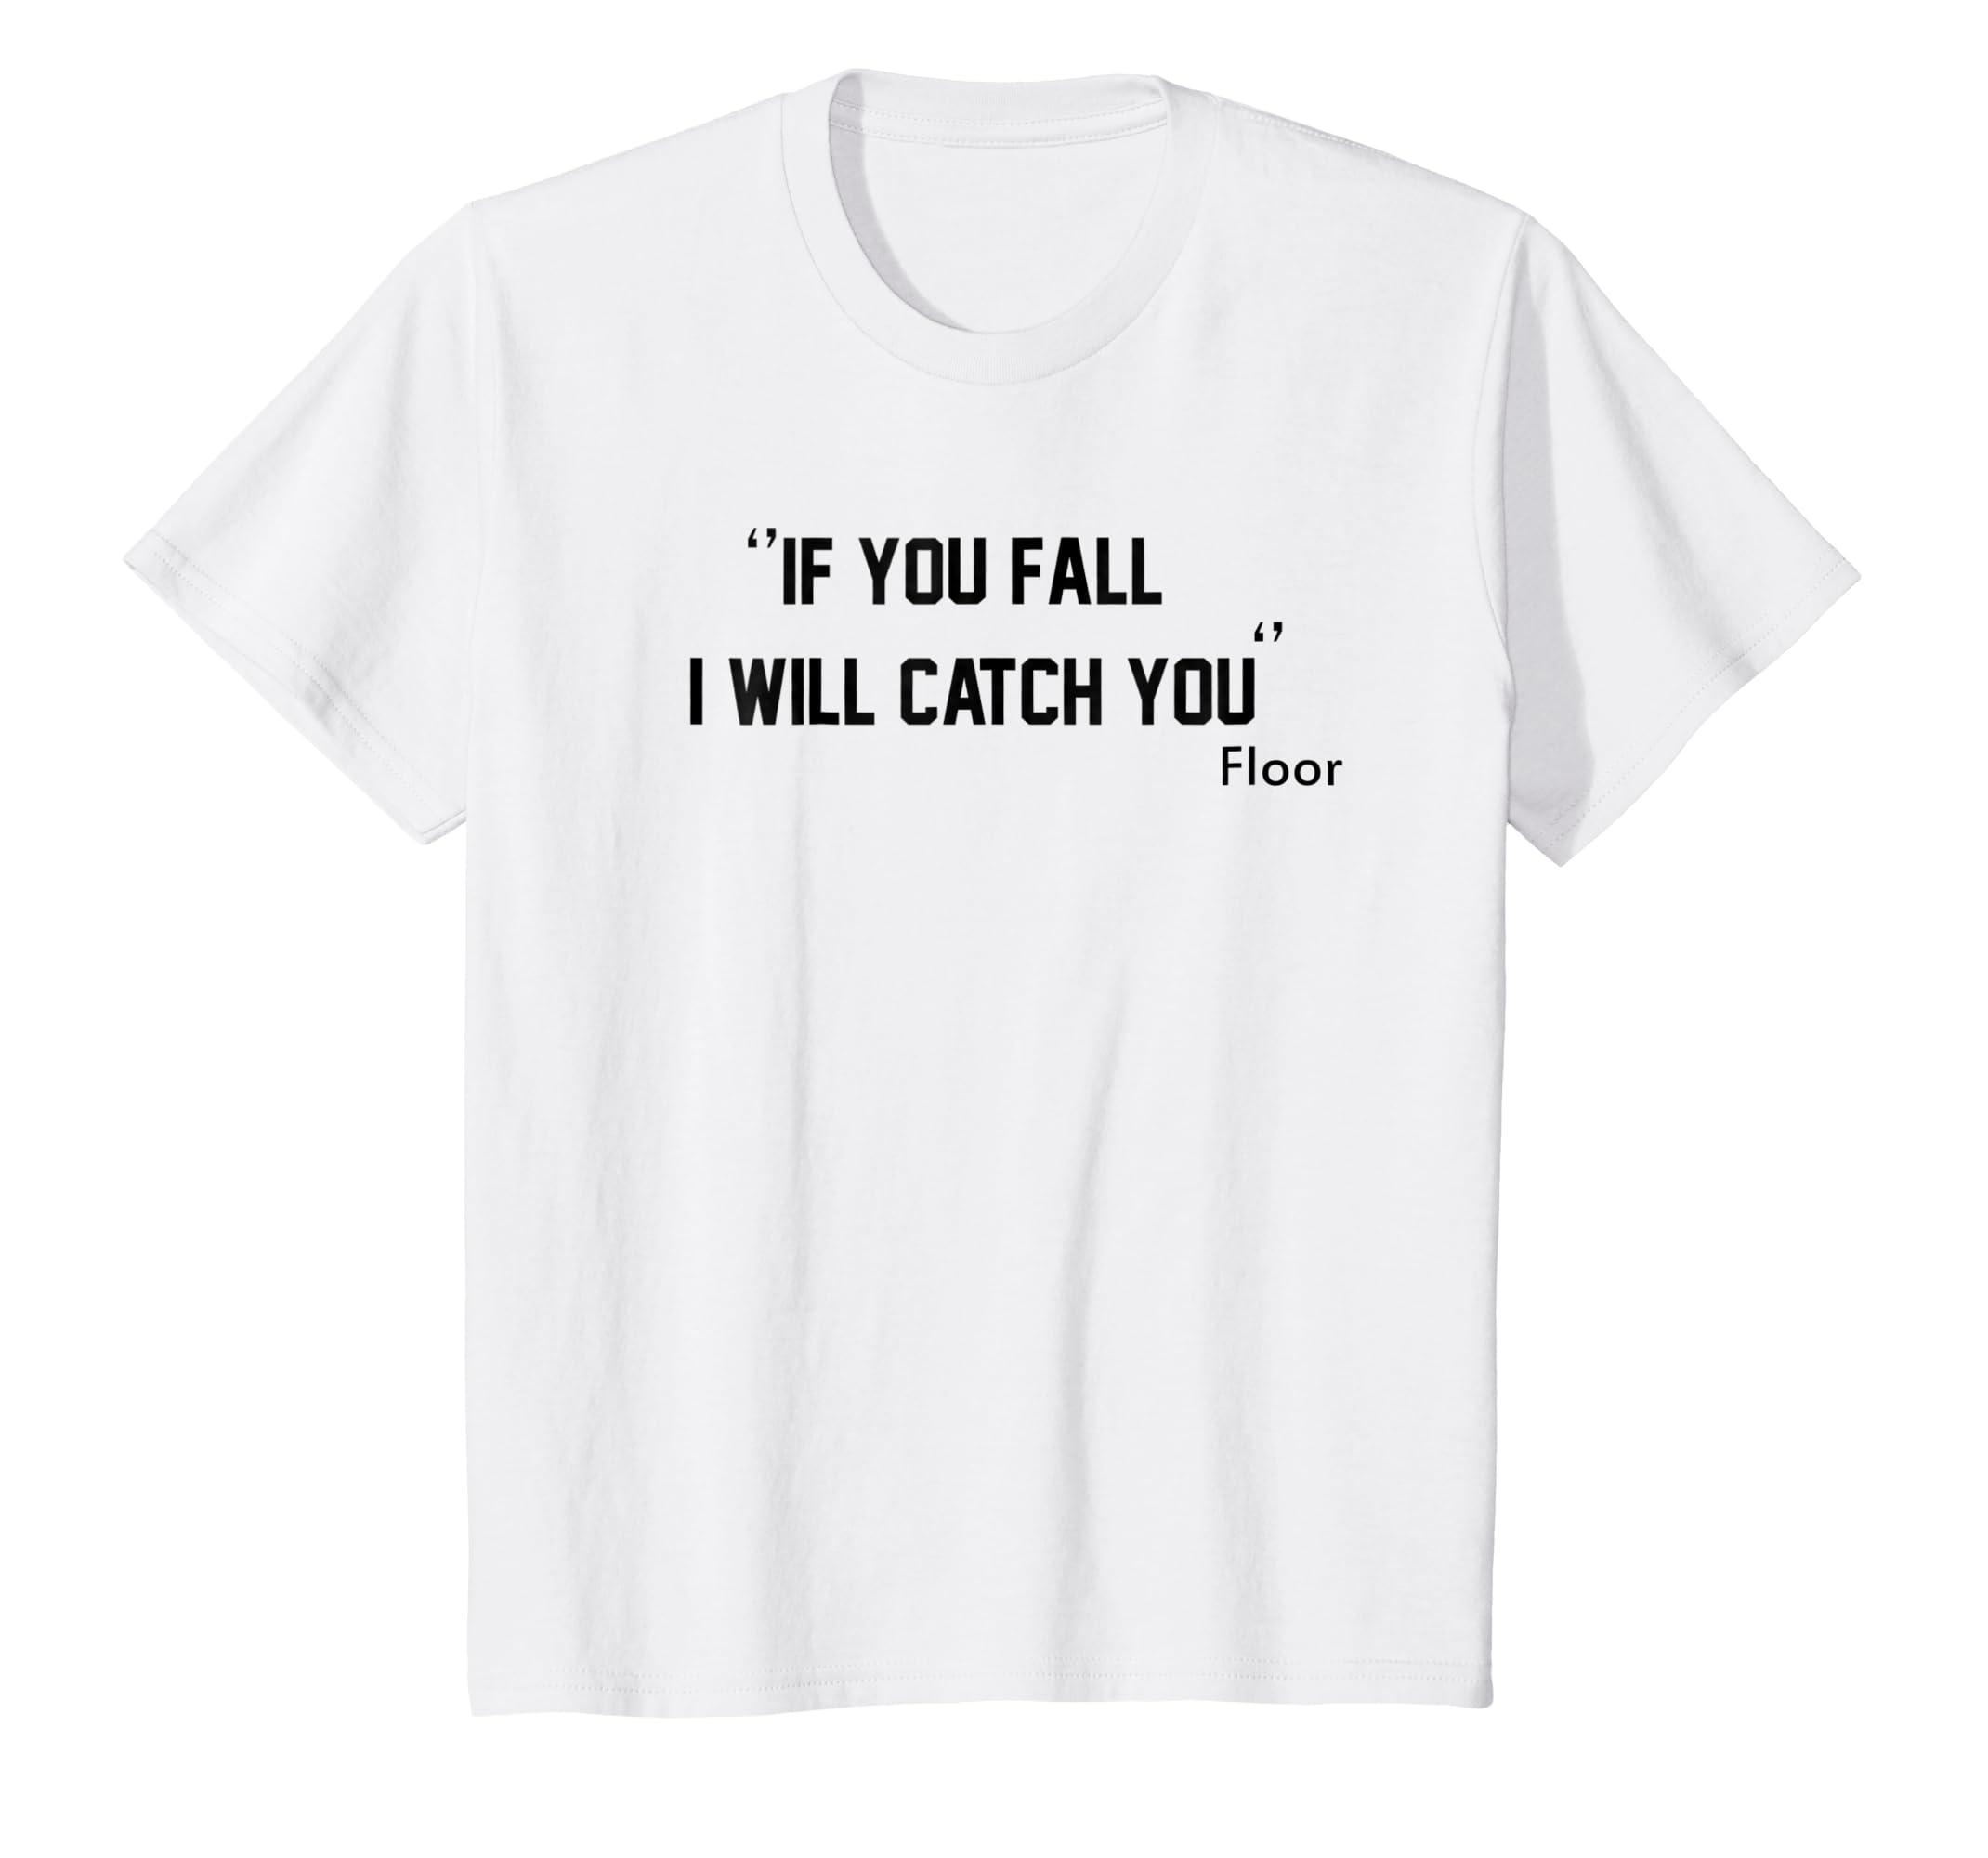 i will catch you